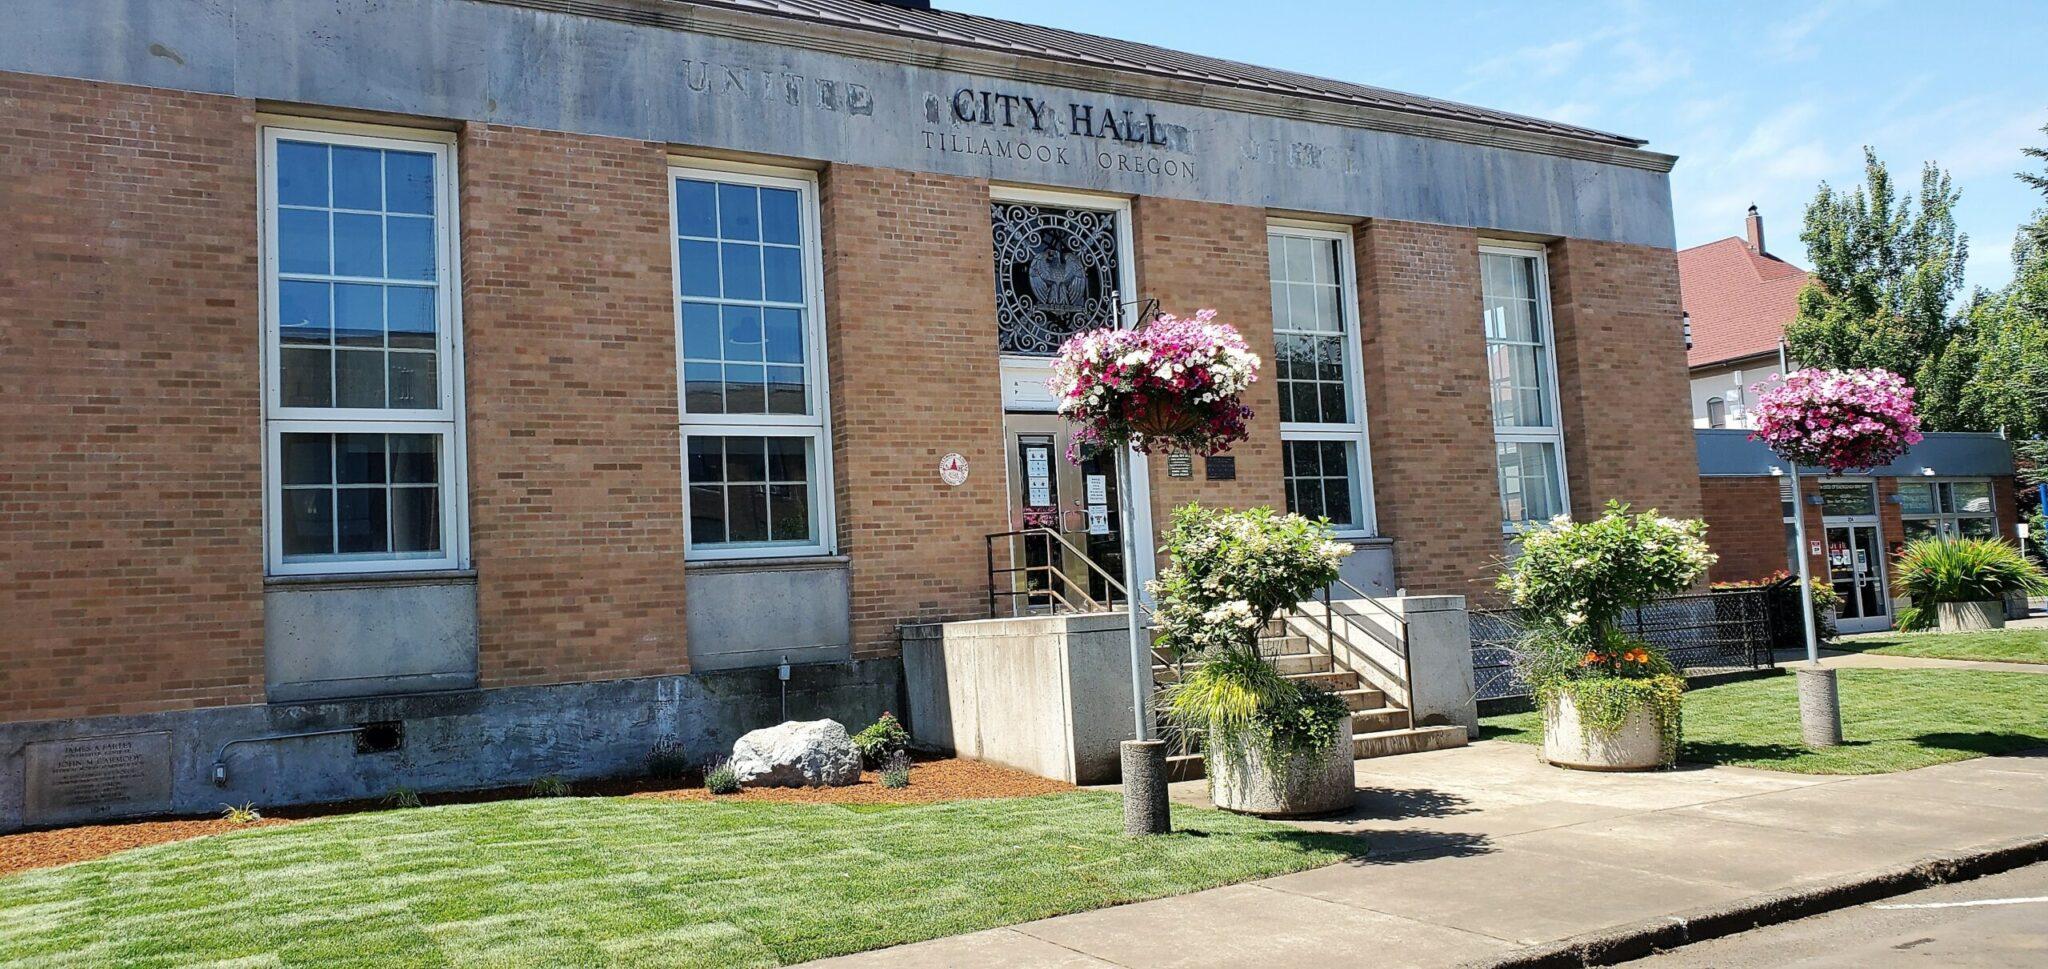 City Hall Tillamook City scaled pTFng5.tmp